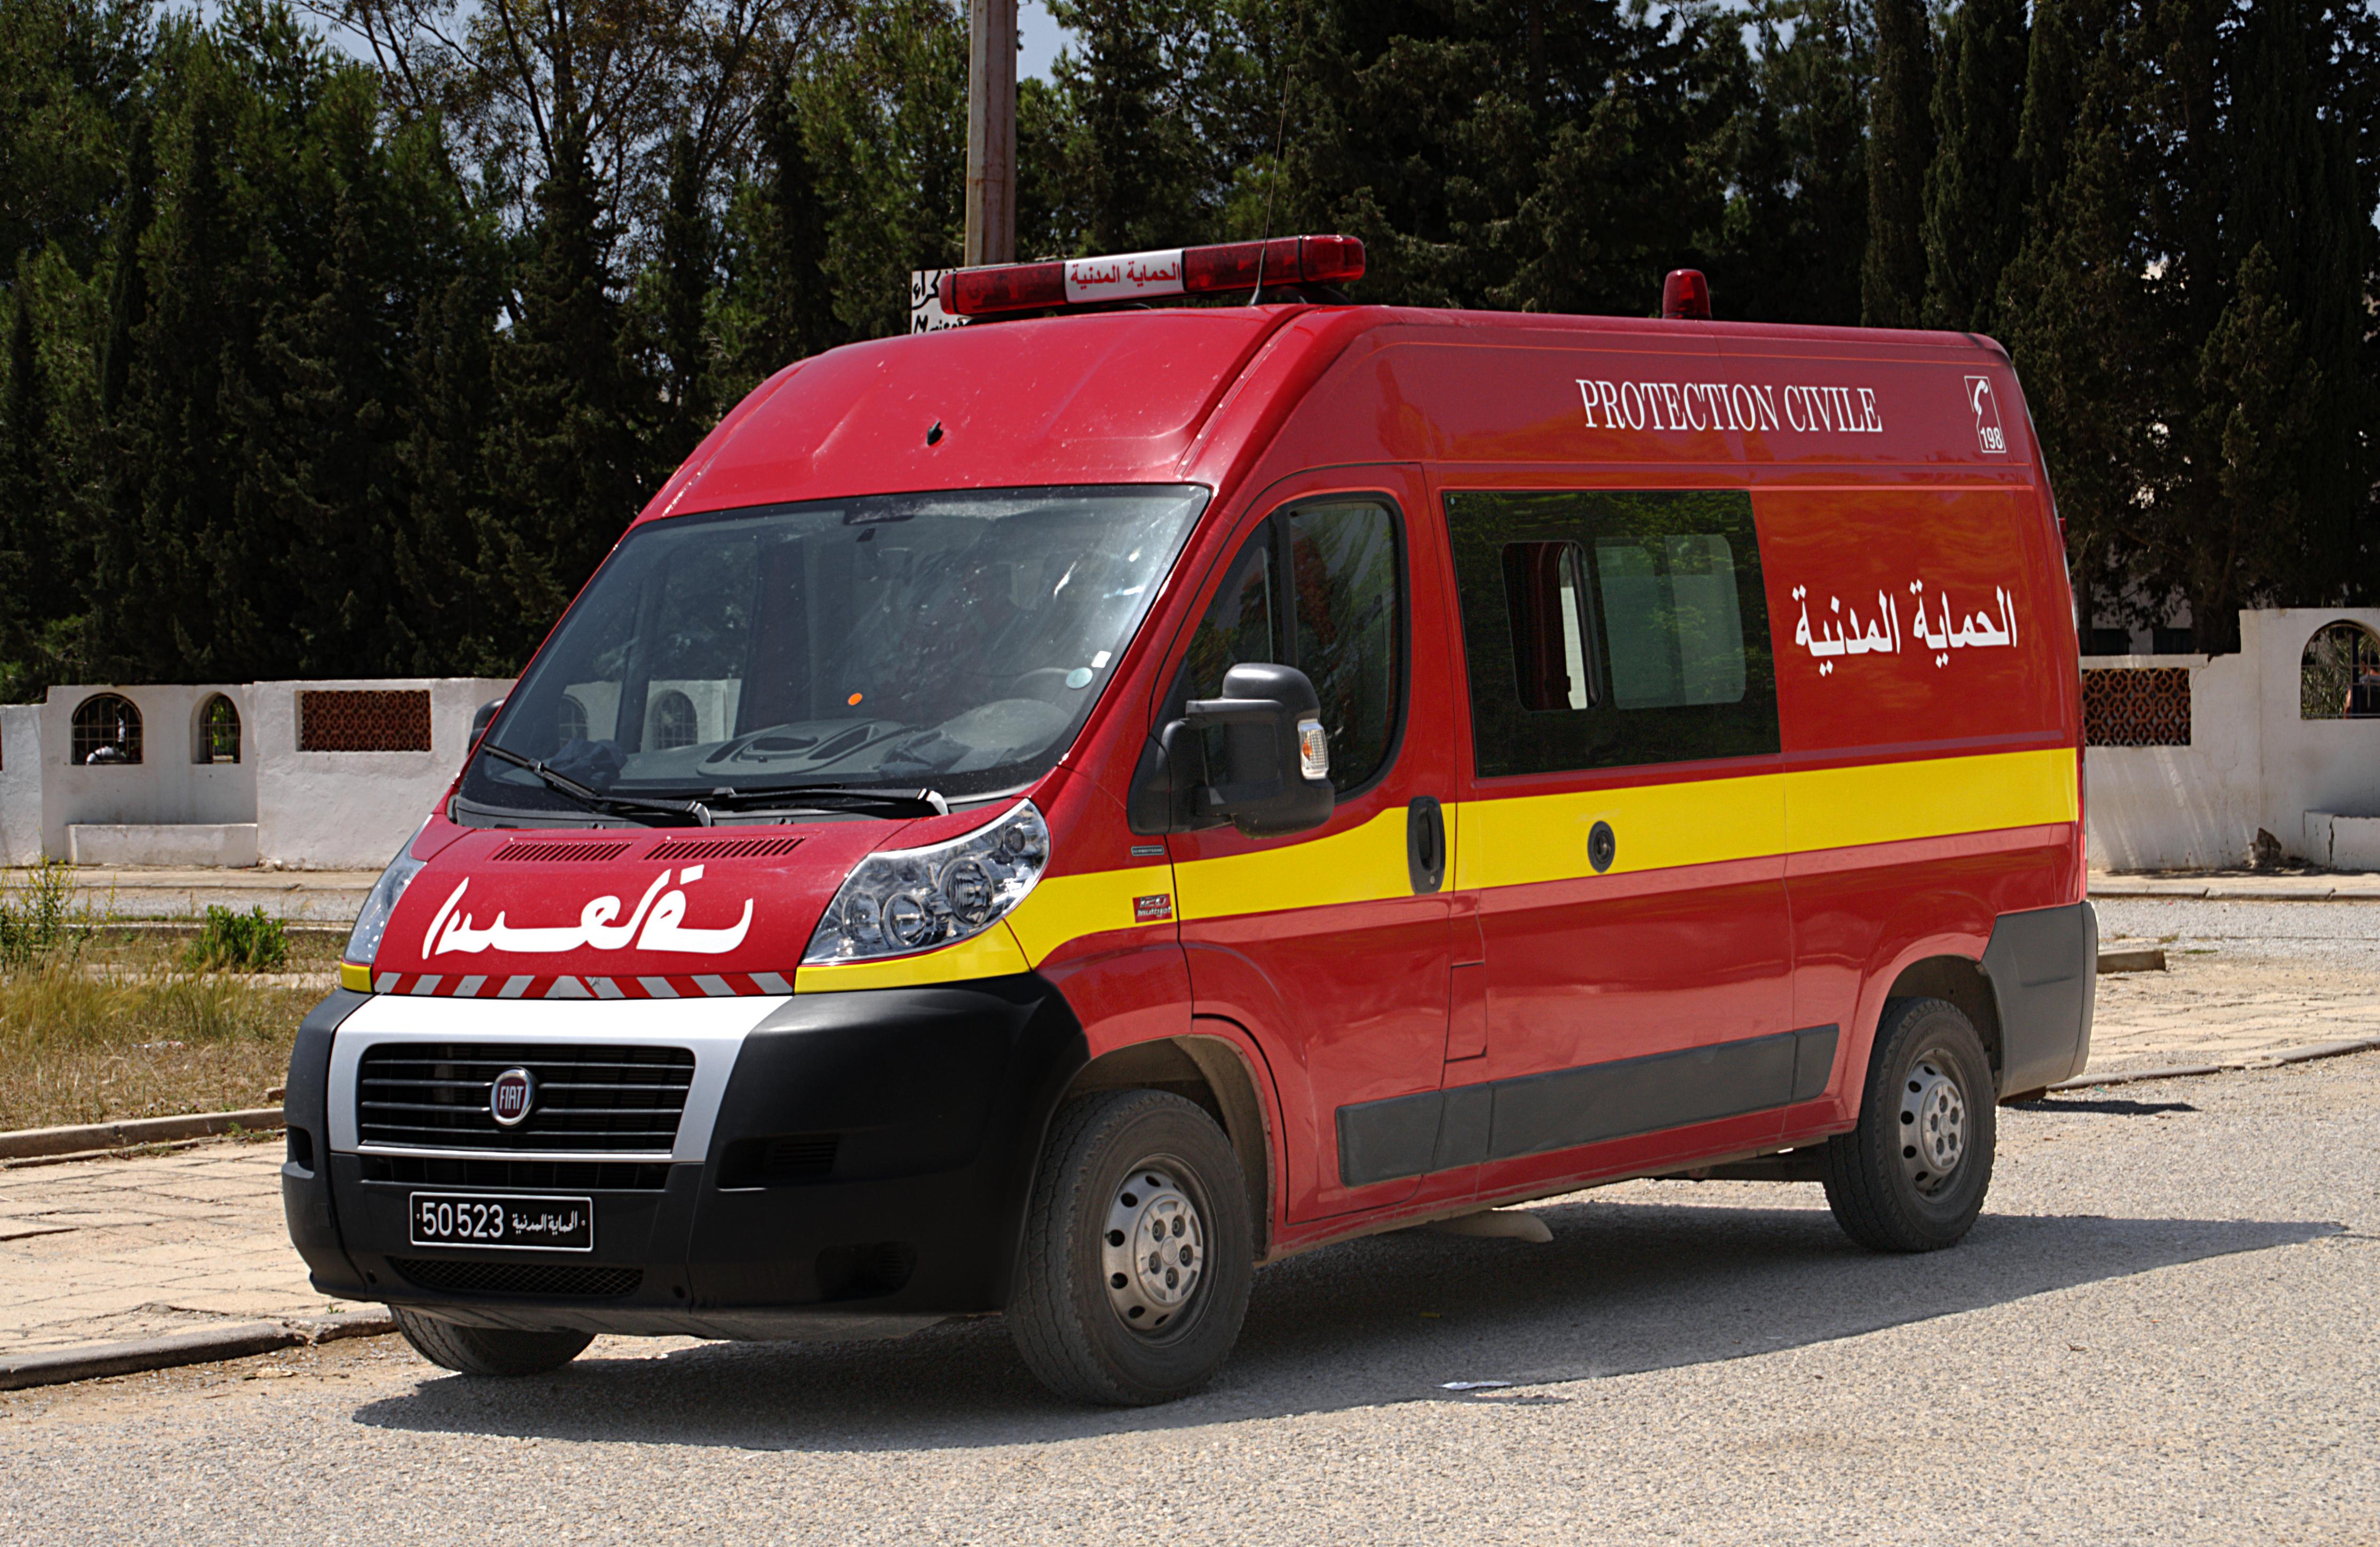 ambulance de la protection civile tunisie mai. Black Bedroom Furniture Sets. Home Design Ideas